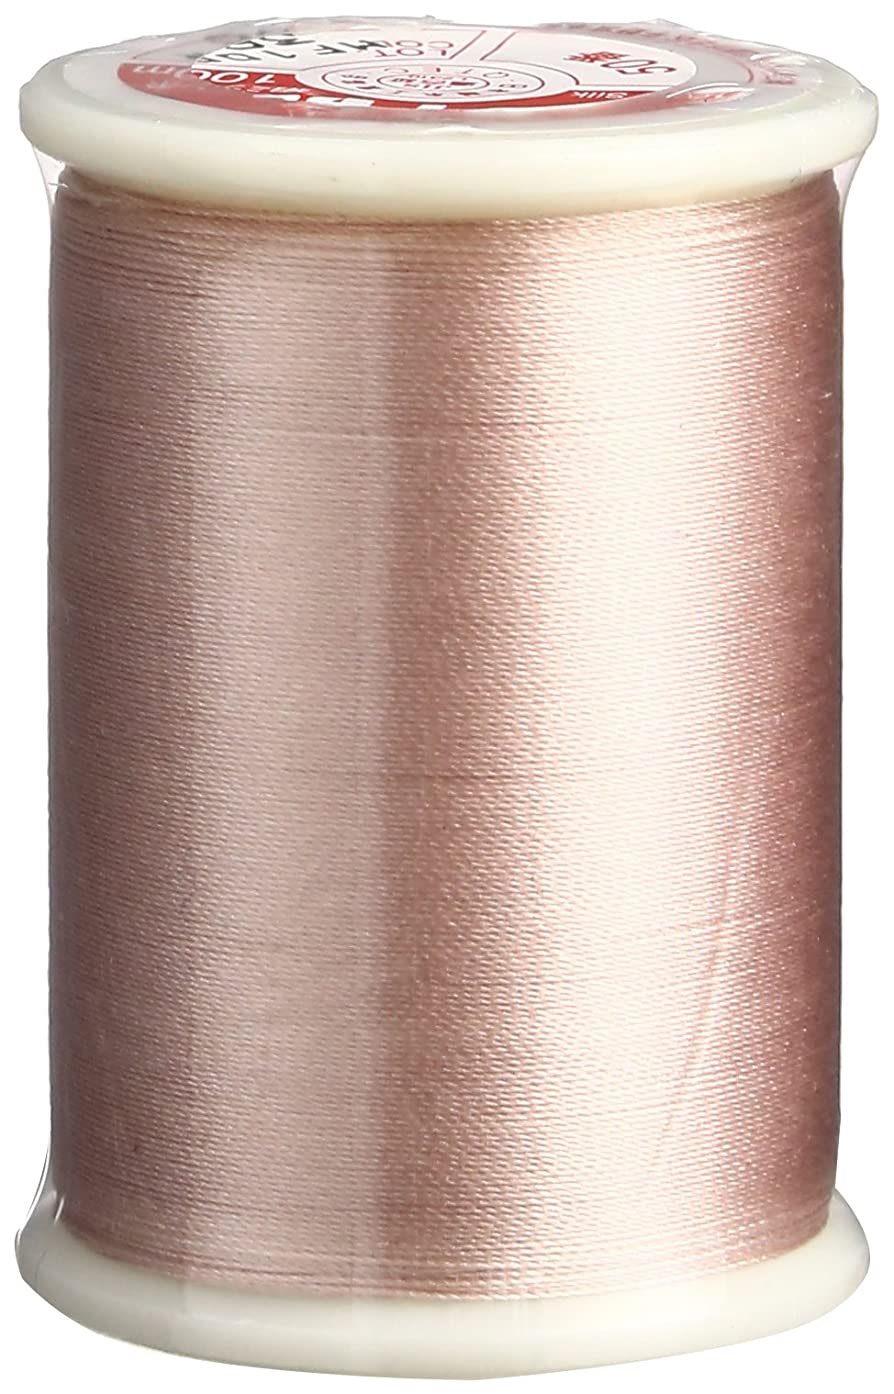 Superior Threads 13601-036 50 WT Tire Filament Silk Thread, Pink, 109 yd